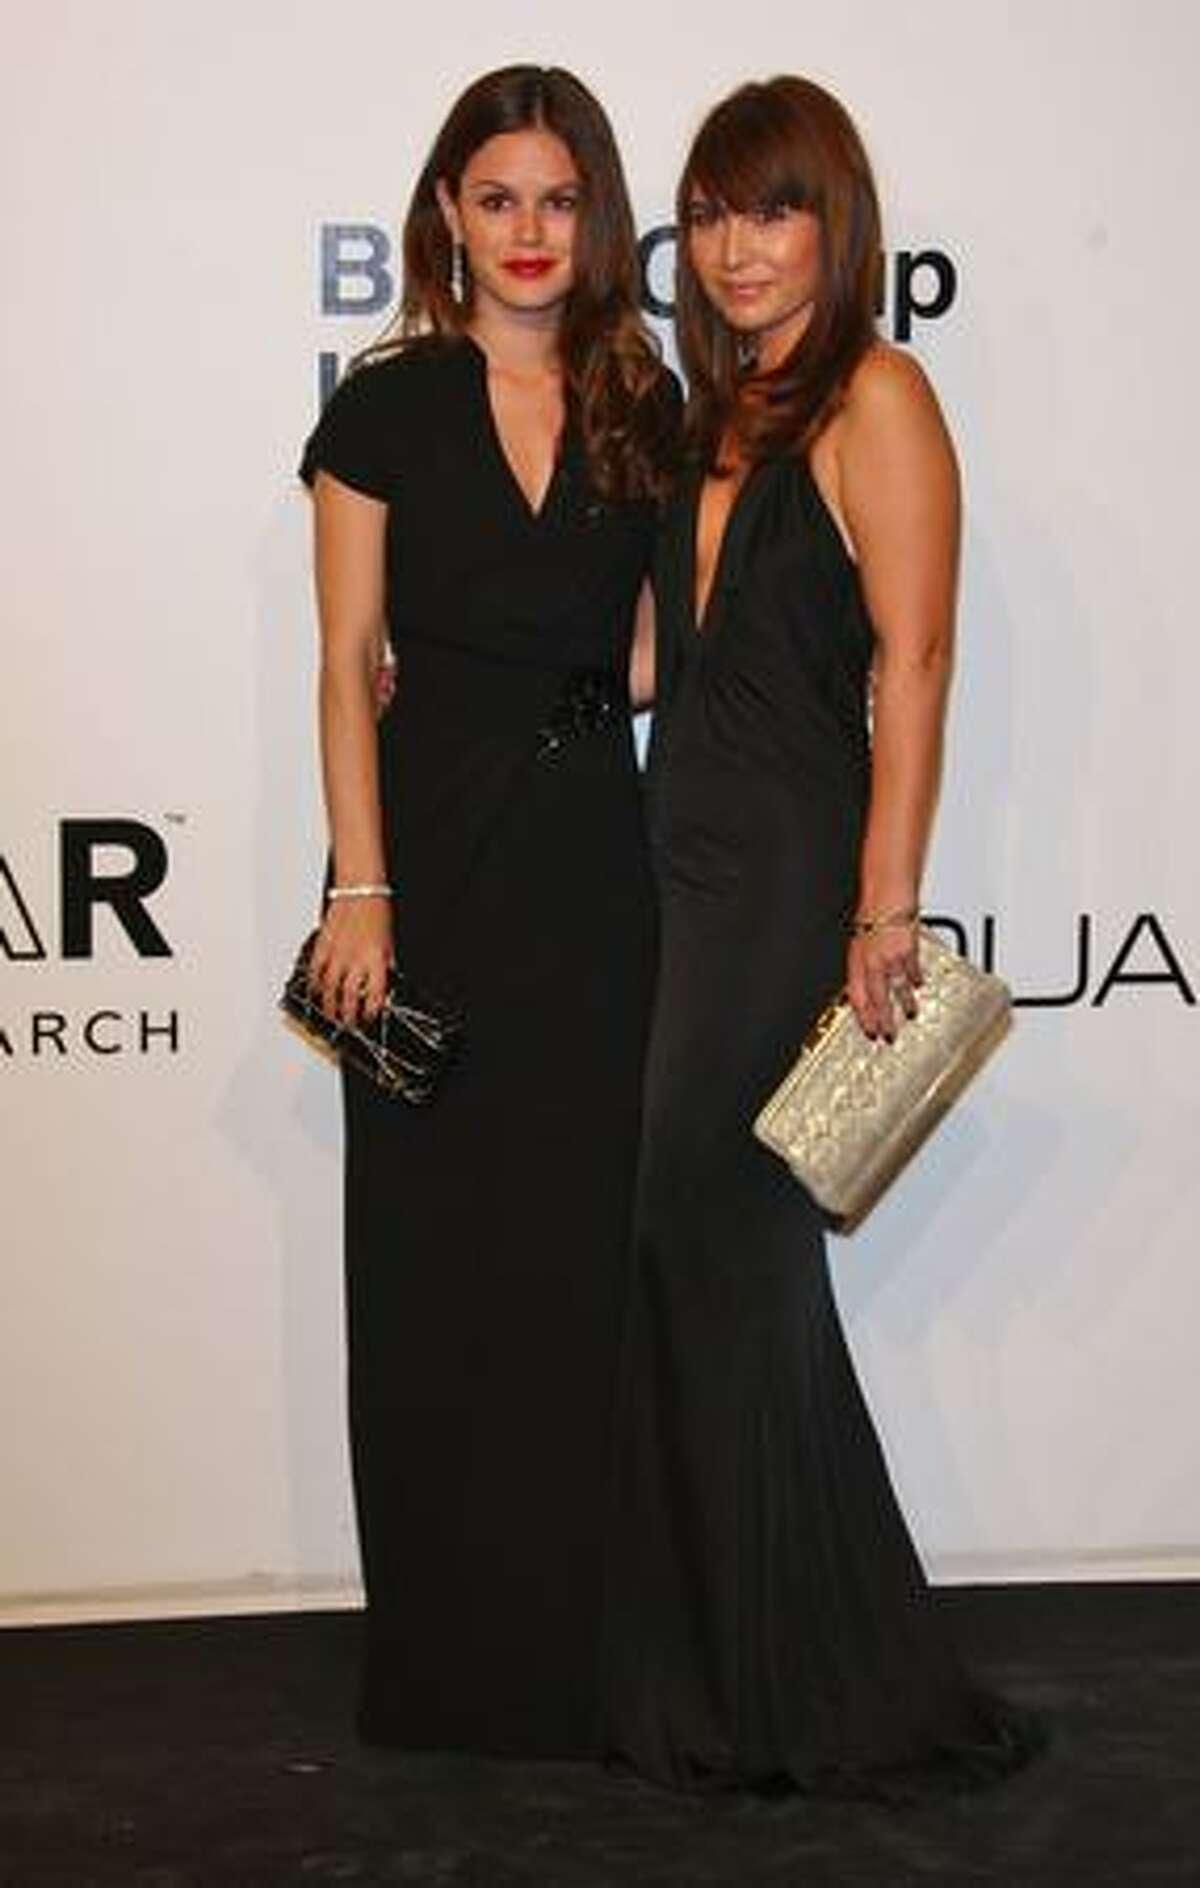 Actress Rachel Bilson and stylist Nicole Chavez arrive.